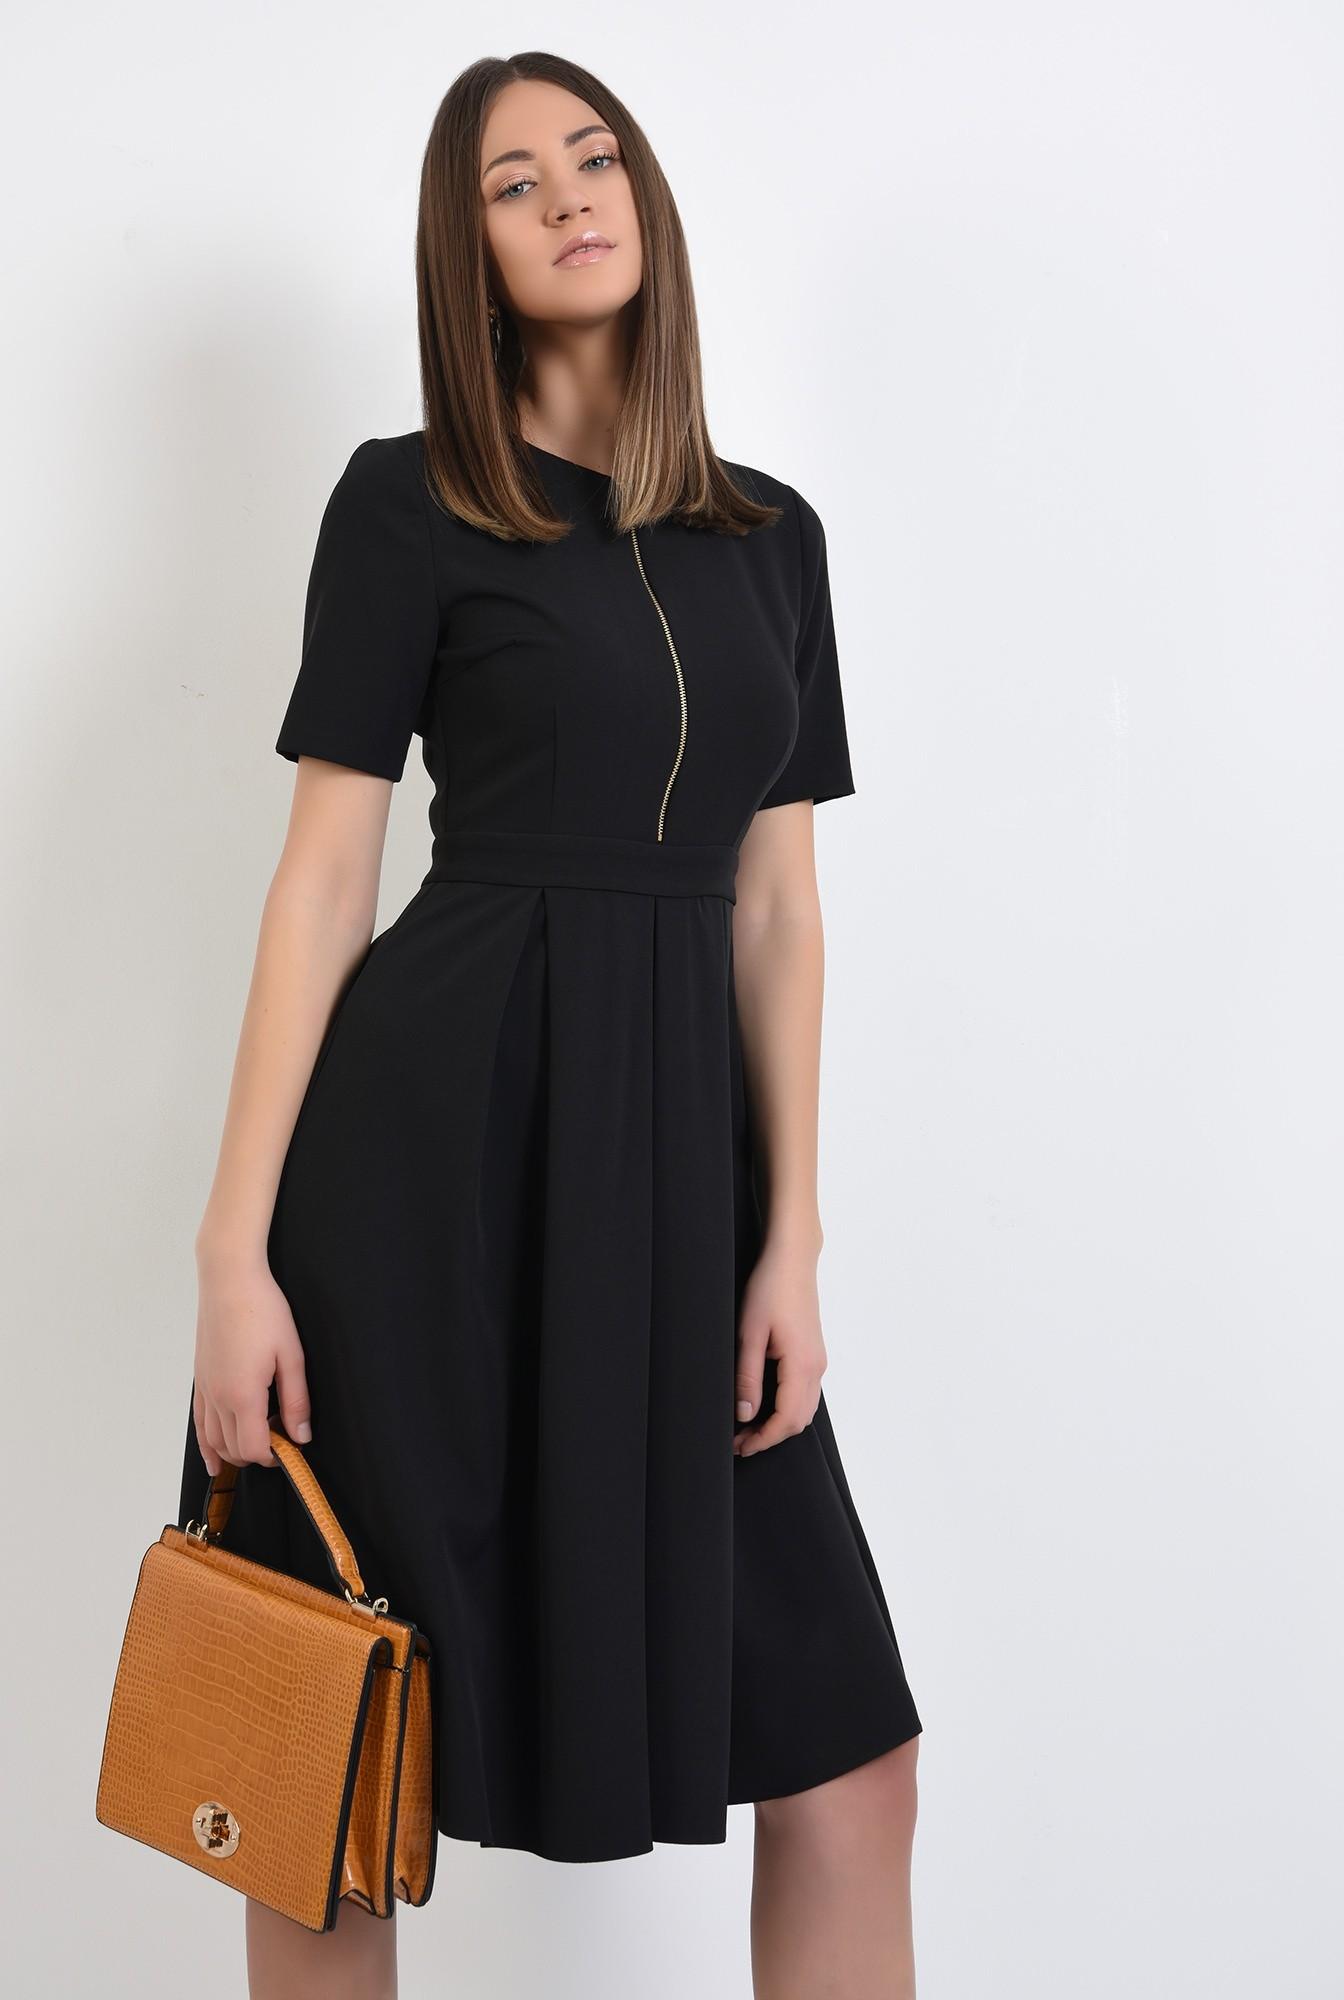 0 - rochie neagra, office, midi, evazata, cu fermoar metalic